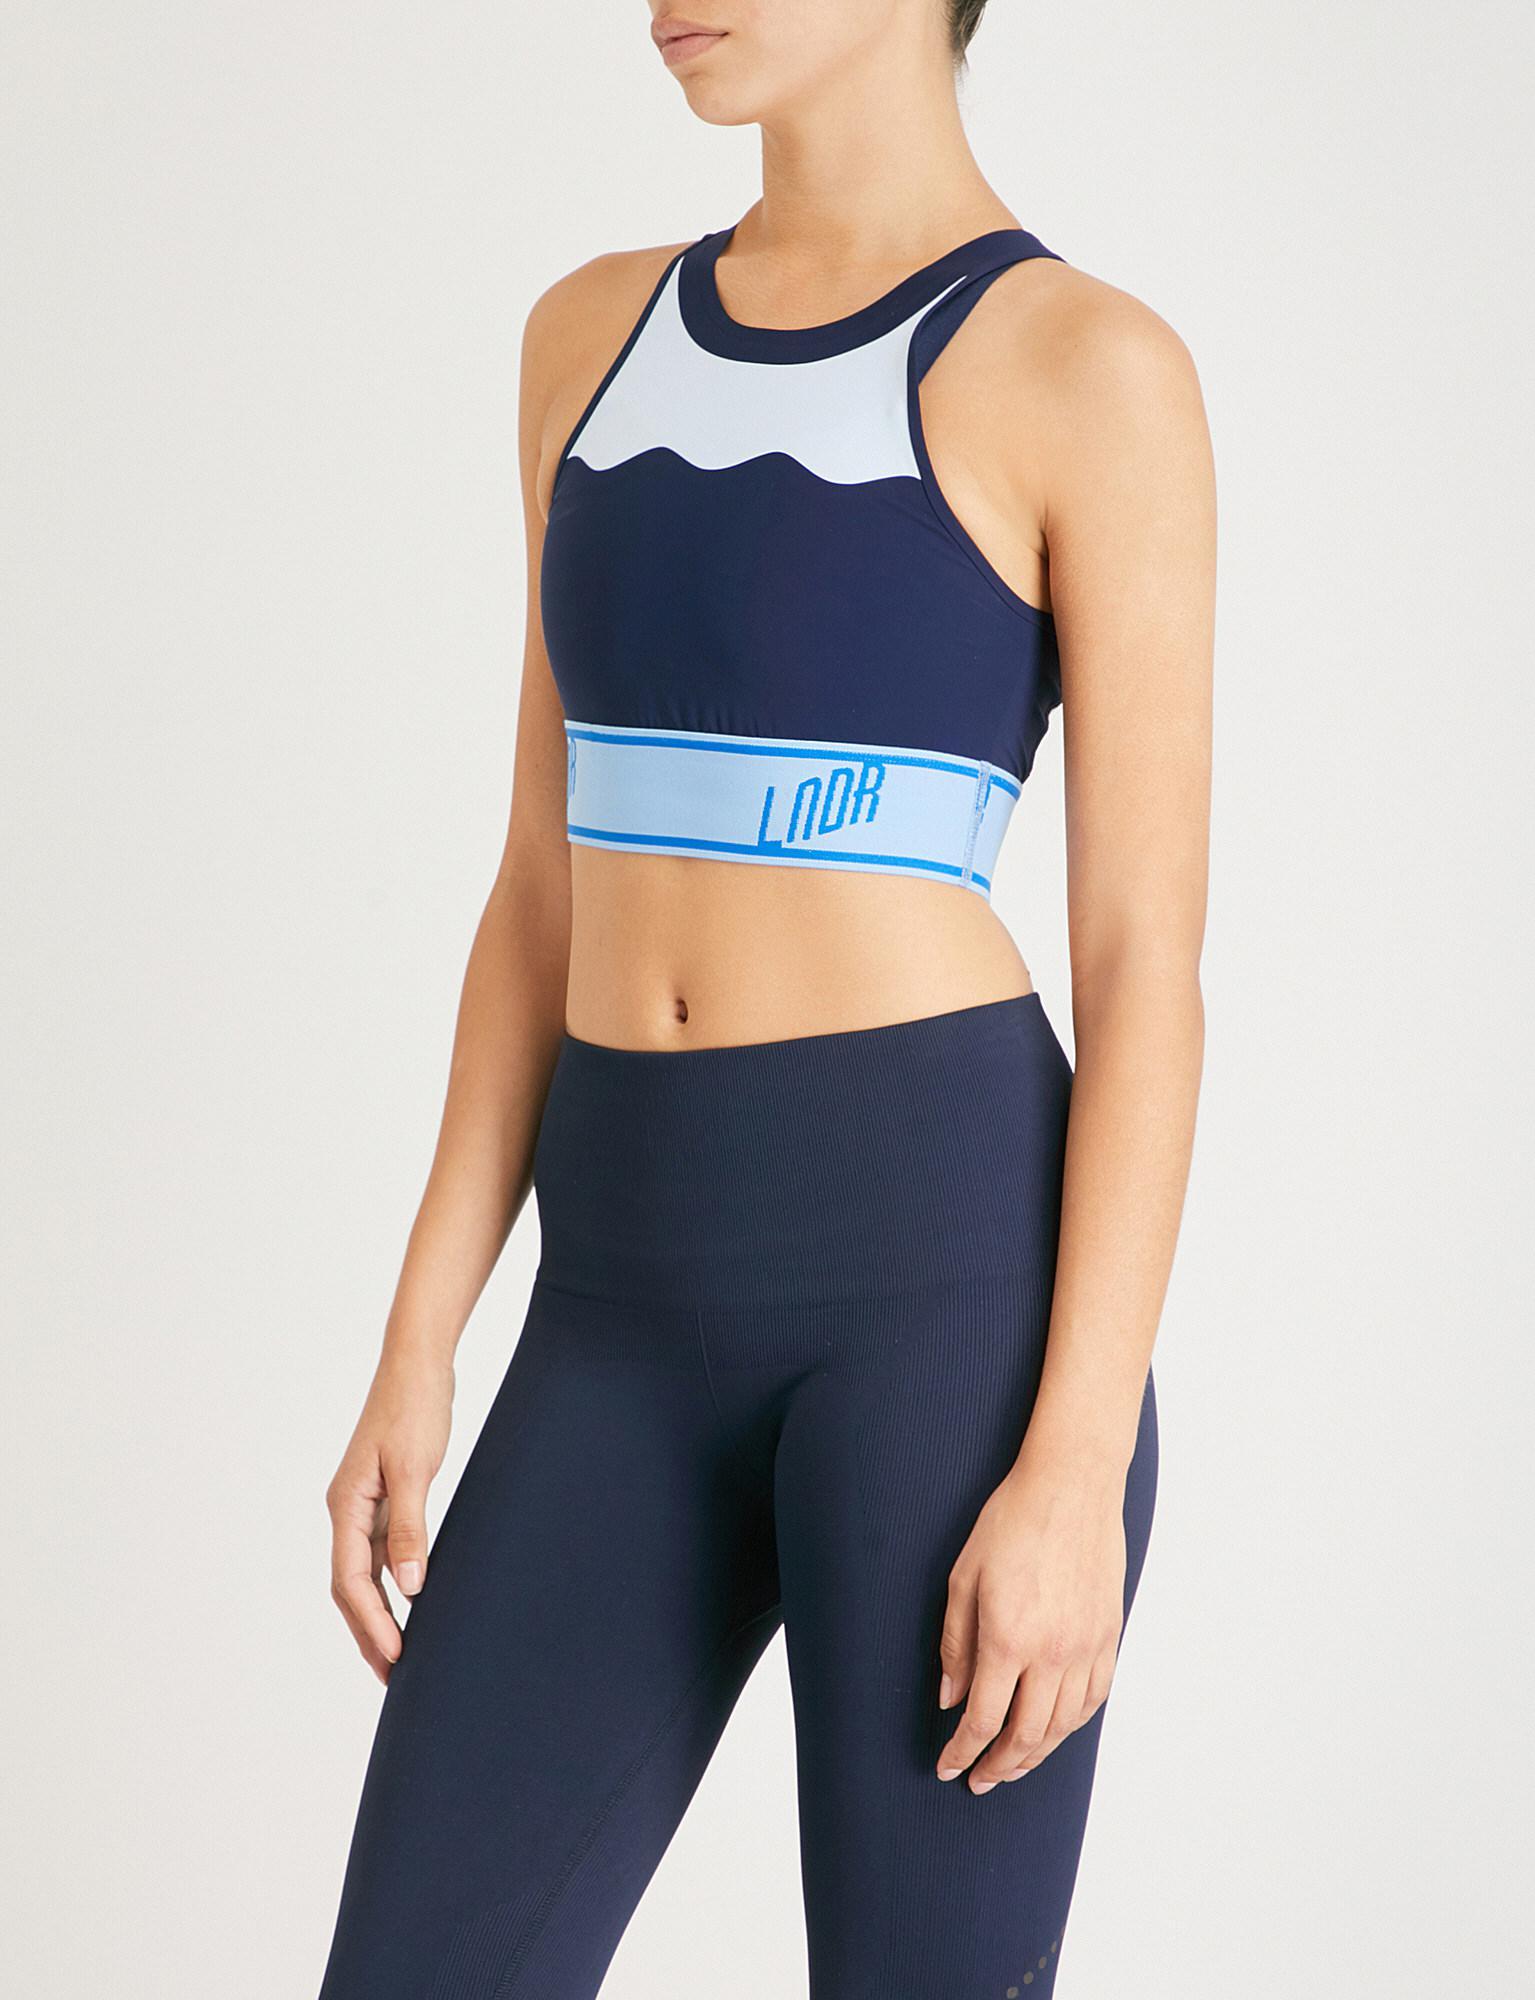 7dce74ec0b1b0 Lndr Swell Stretch-jersey Sports Bra in Blue - Lyst